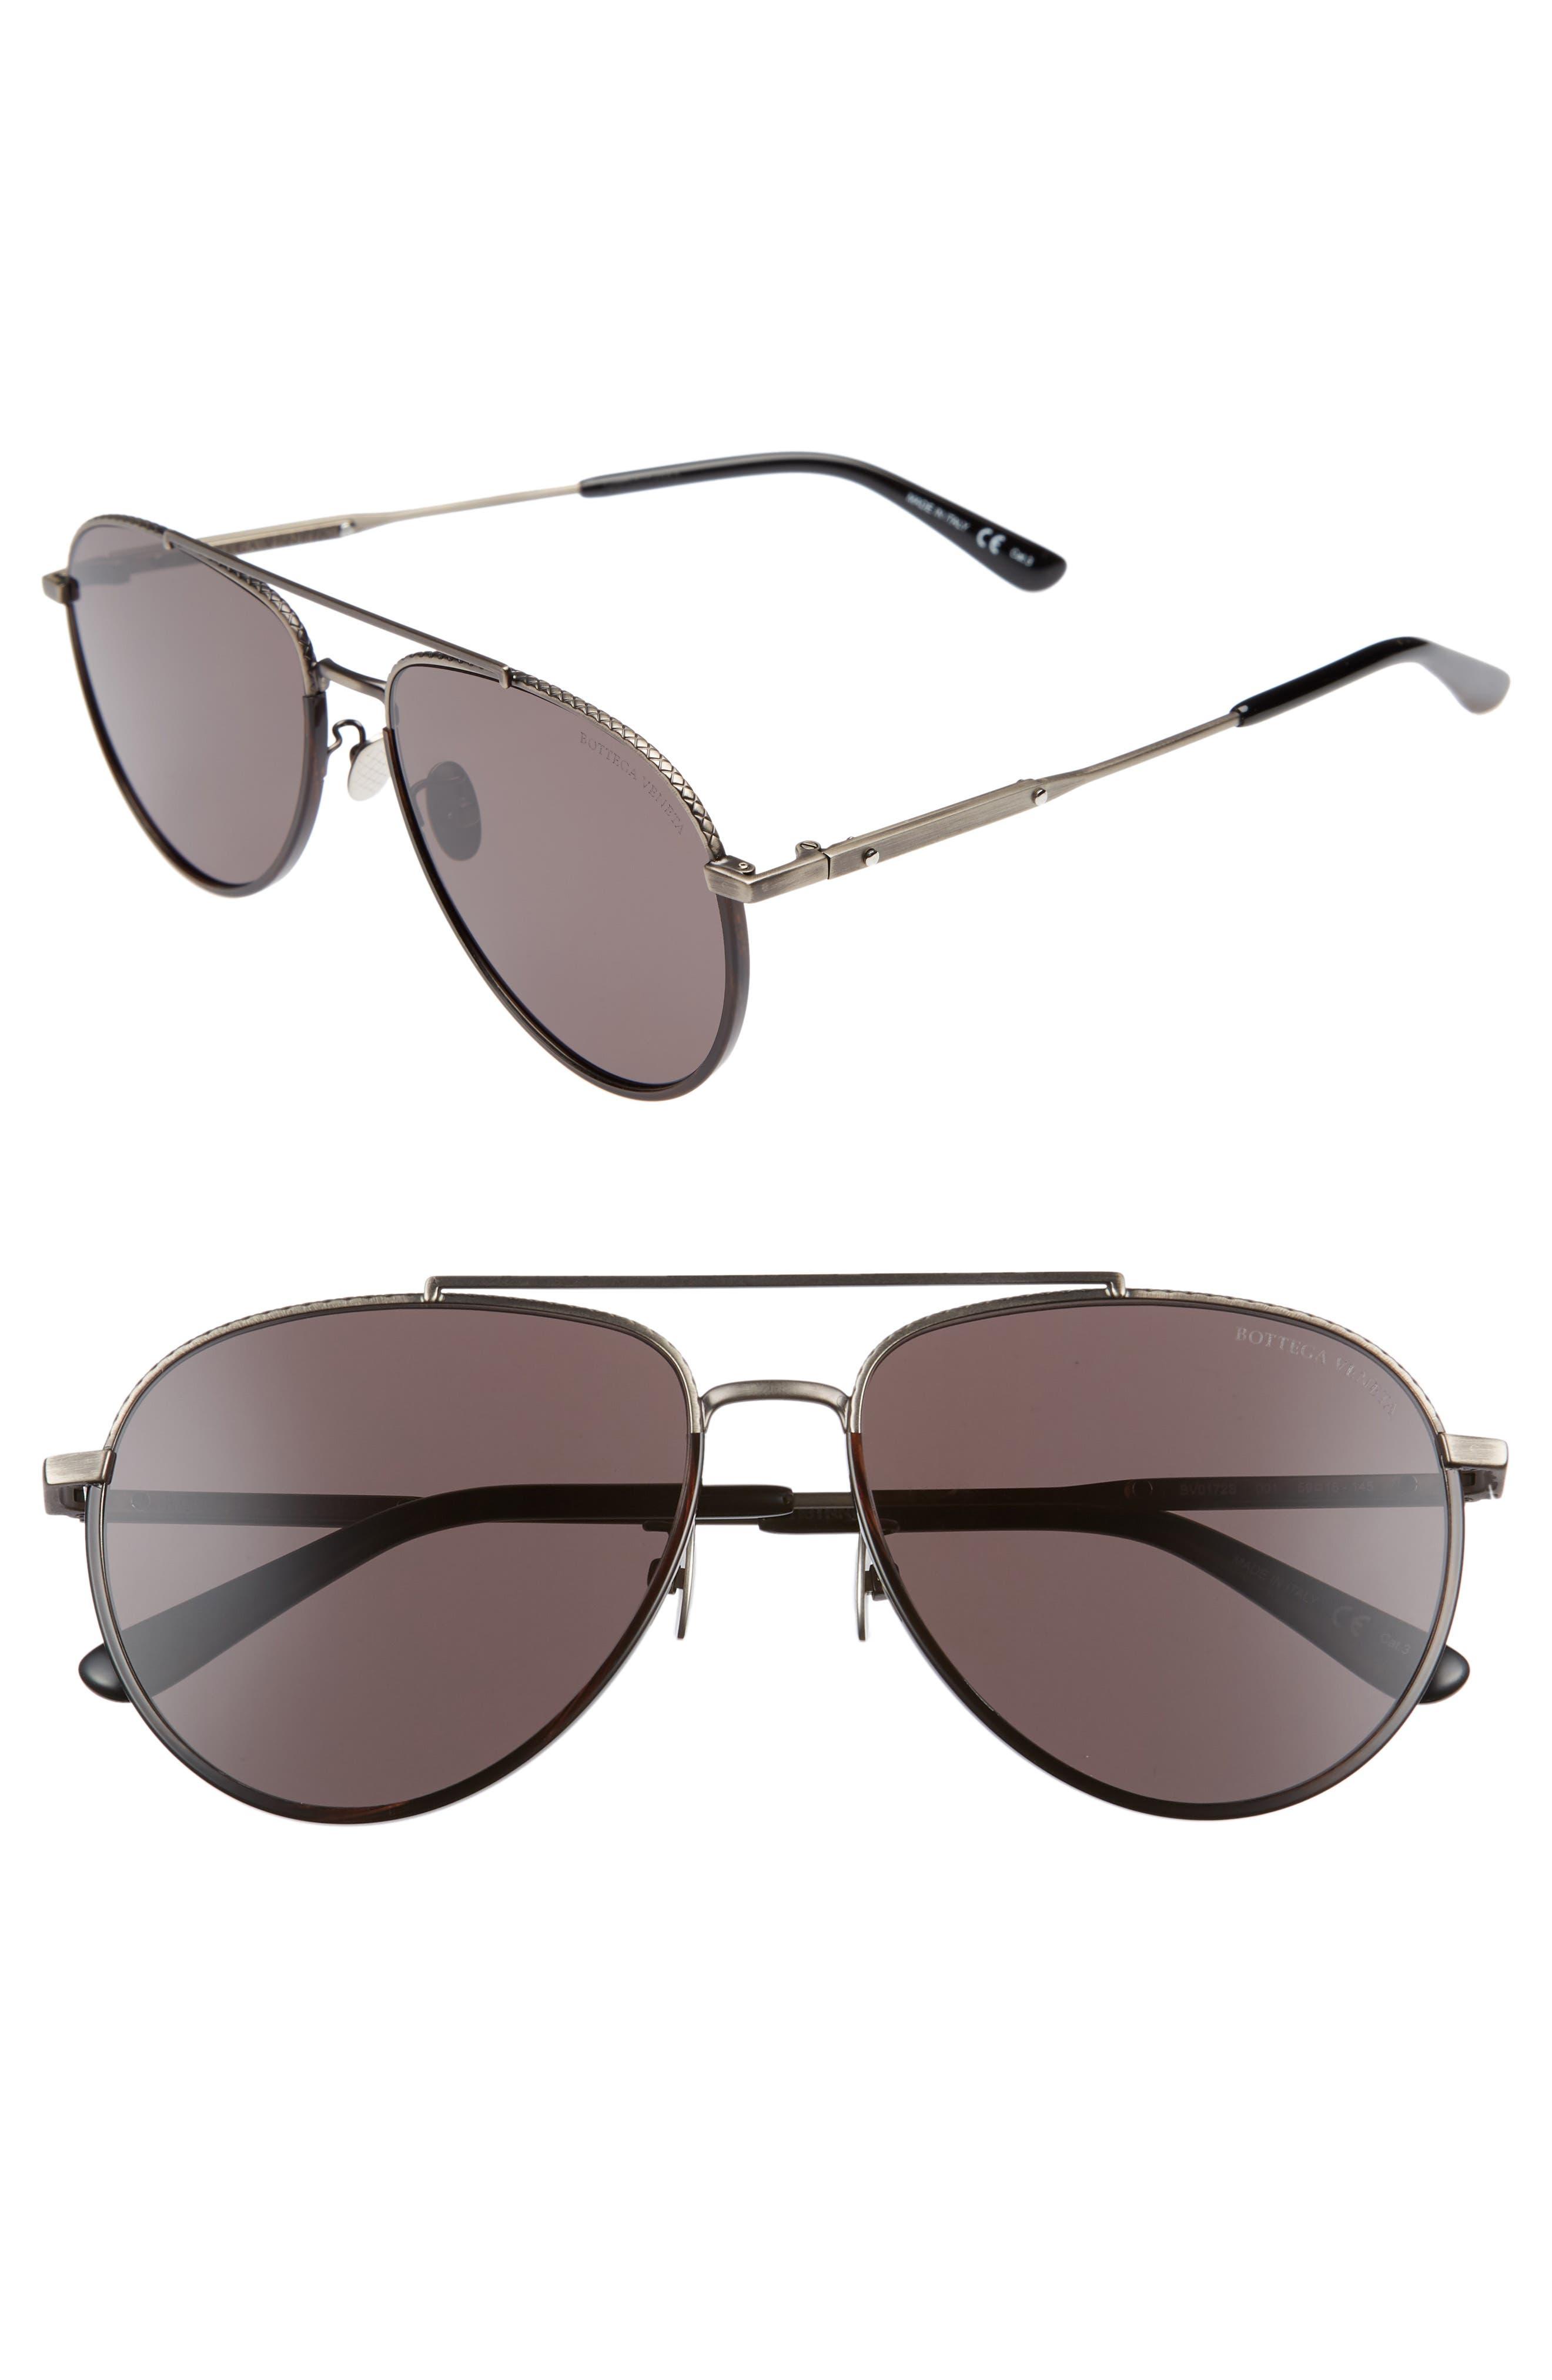 59mm Aviator Sunglasses,                             Main thumbnail 1, color,                             SILVER/ BLACK